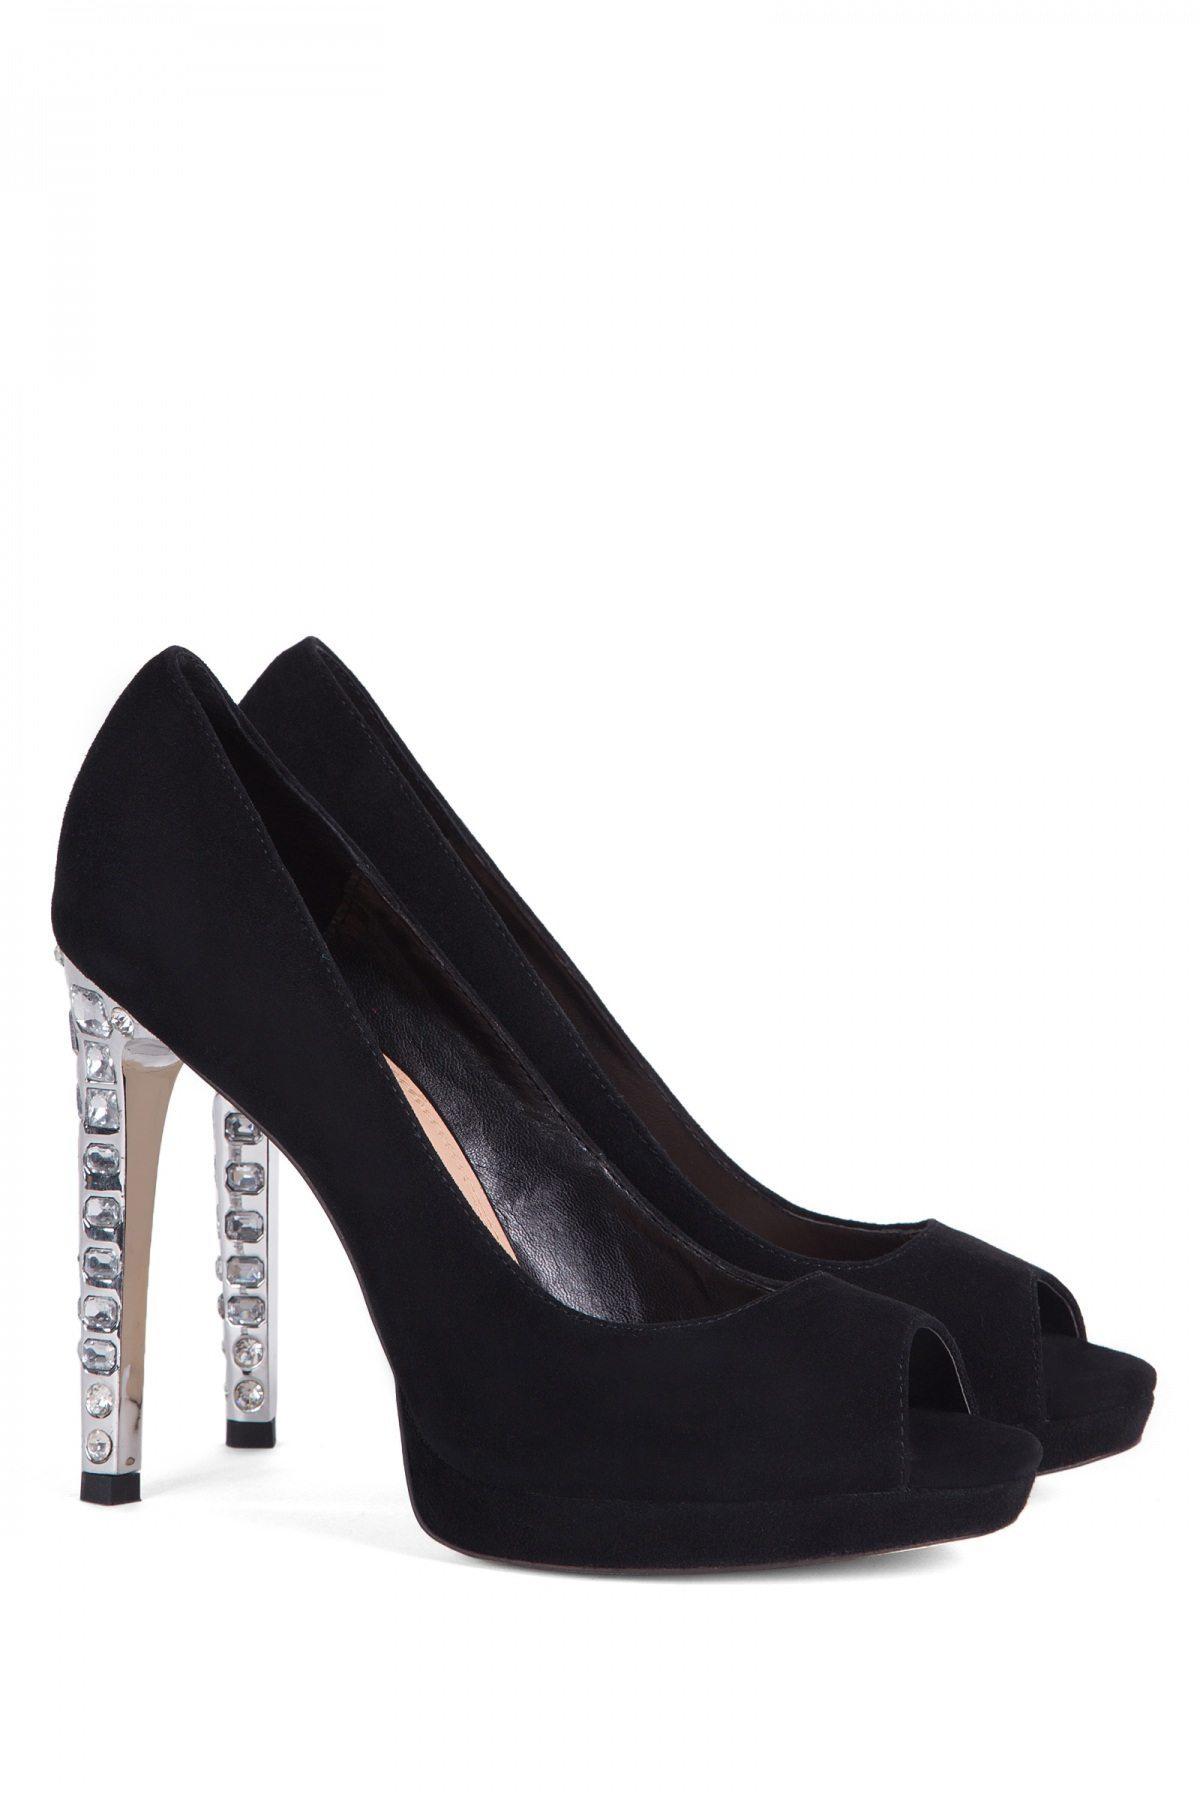 Pantofi Cu Toc Expa11 Negru